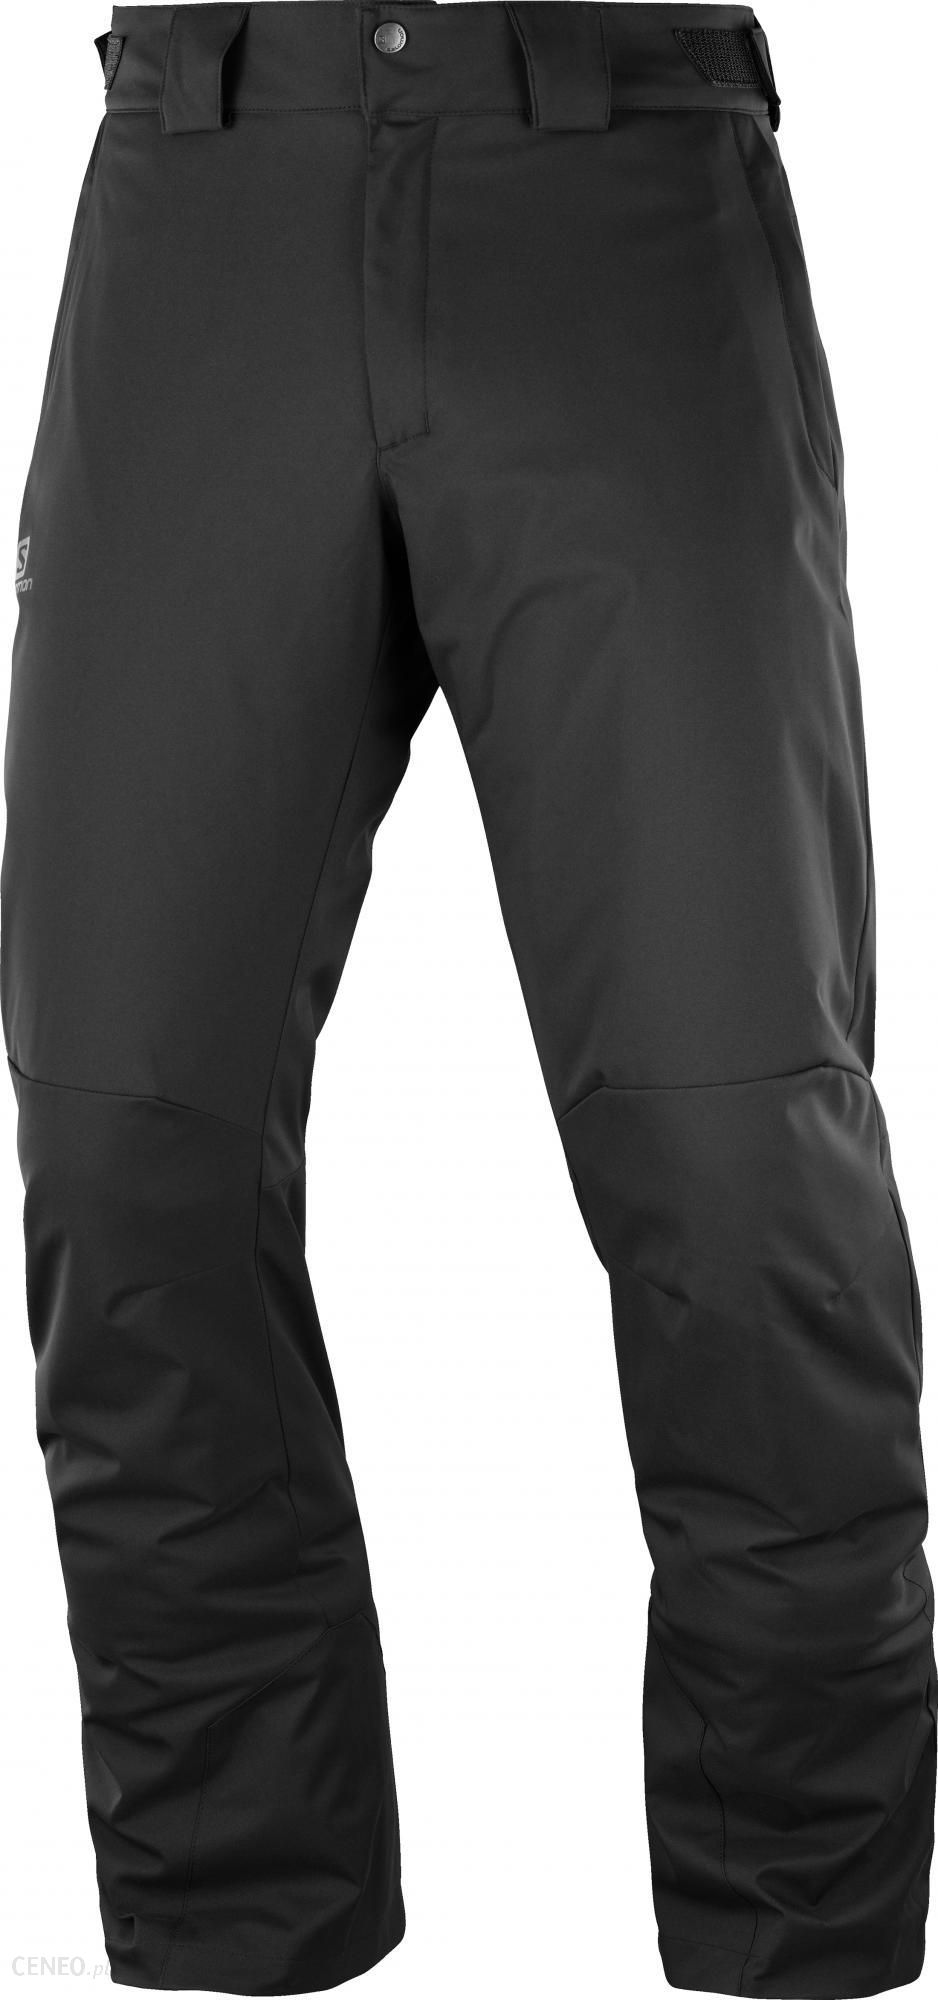 Salomon Męskie Spodnie Narciarskie Stormpunch Pant M Black - Ceny i ... 65a2b98072d